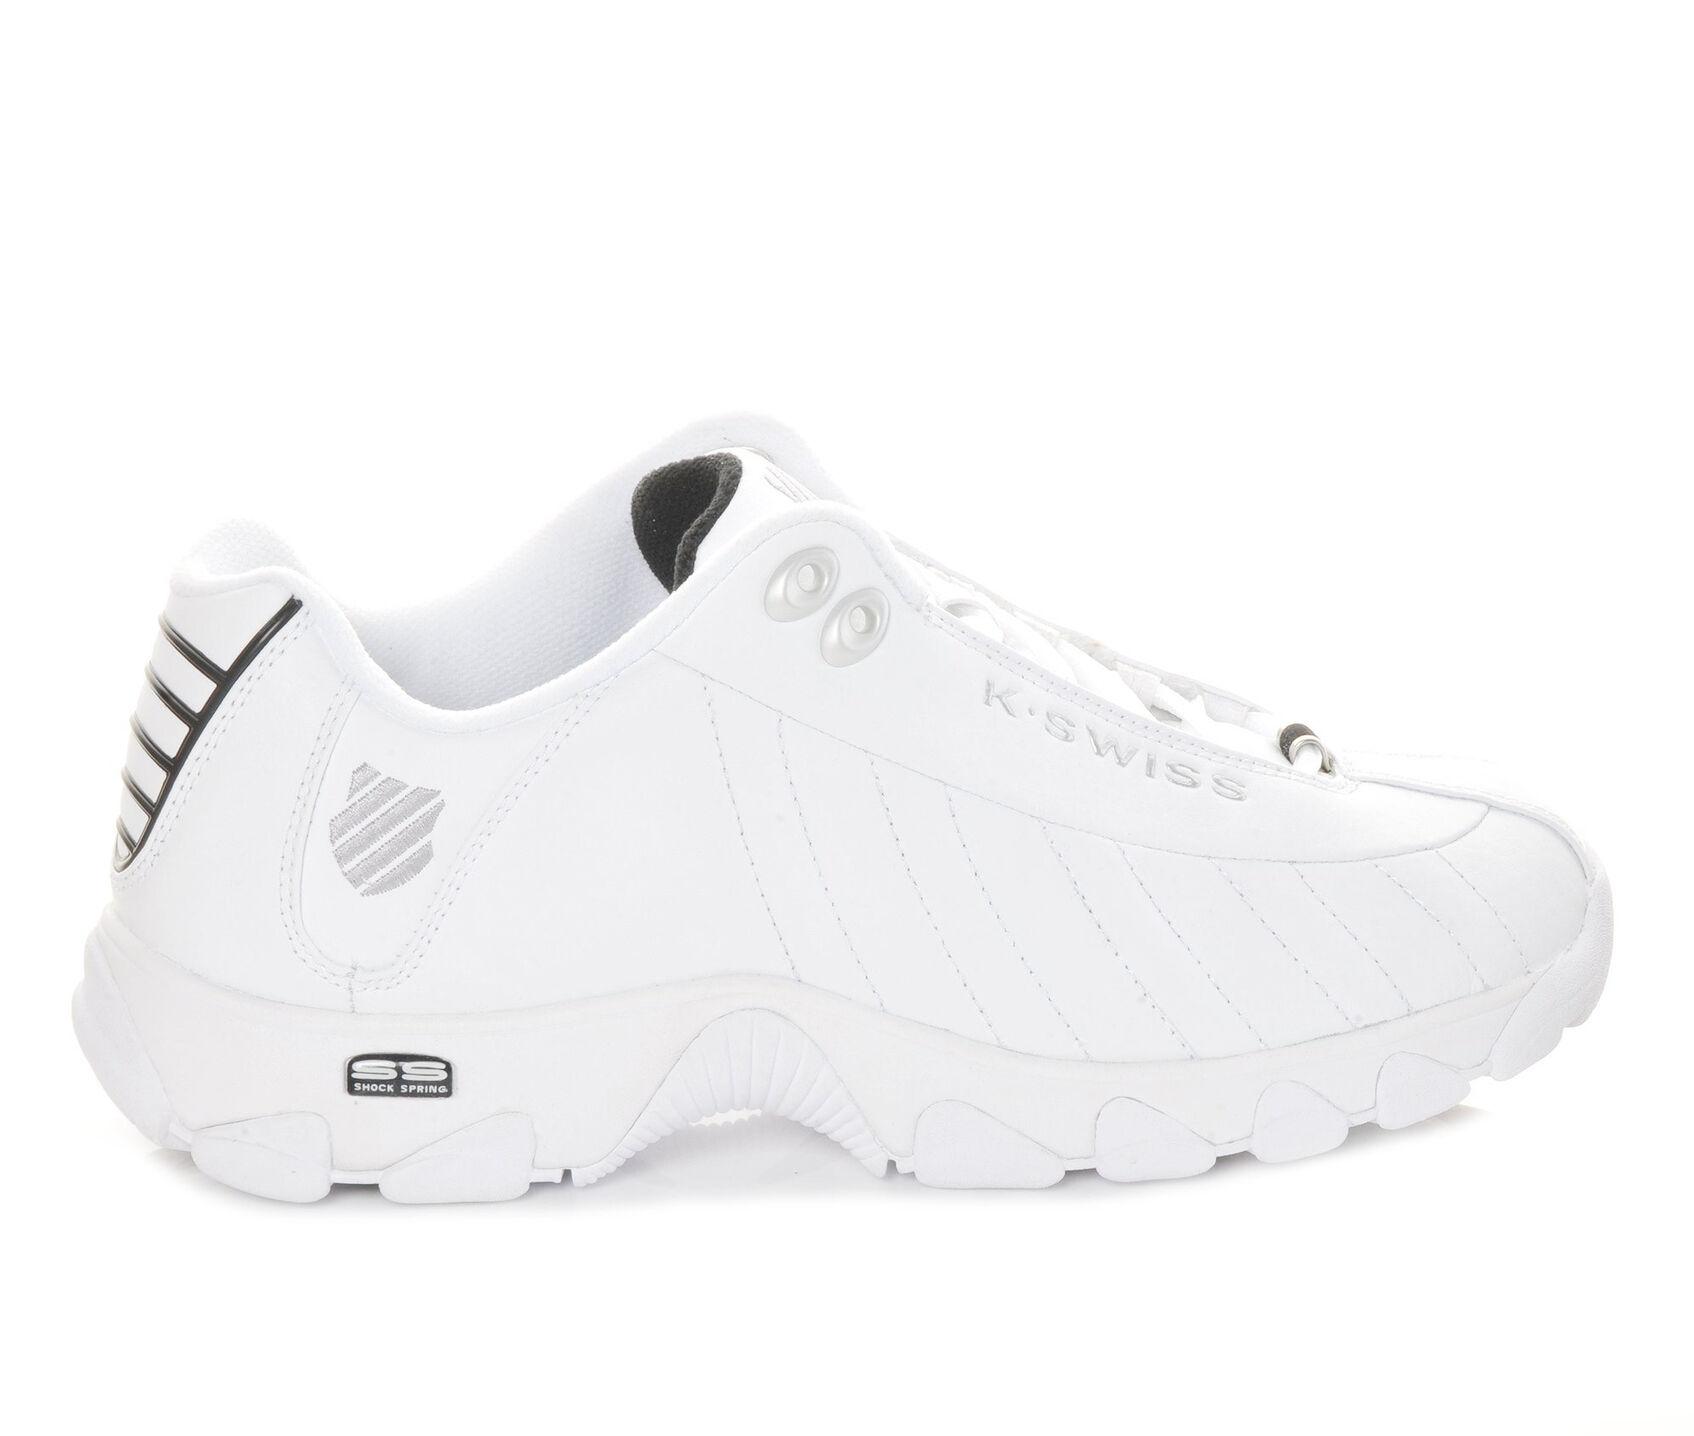 8f785f5ad Men's K-Swiss ST329 Comfort Tennis Shoes | Shoe Carnival